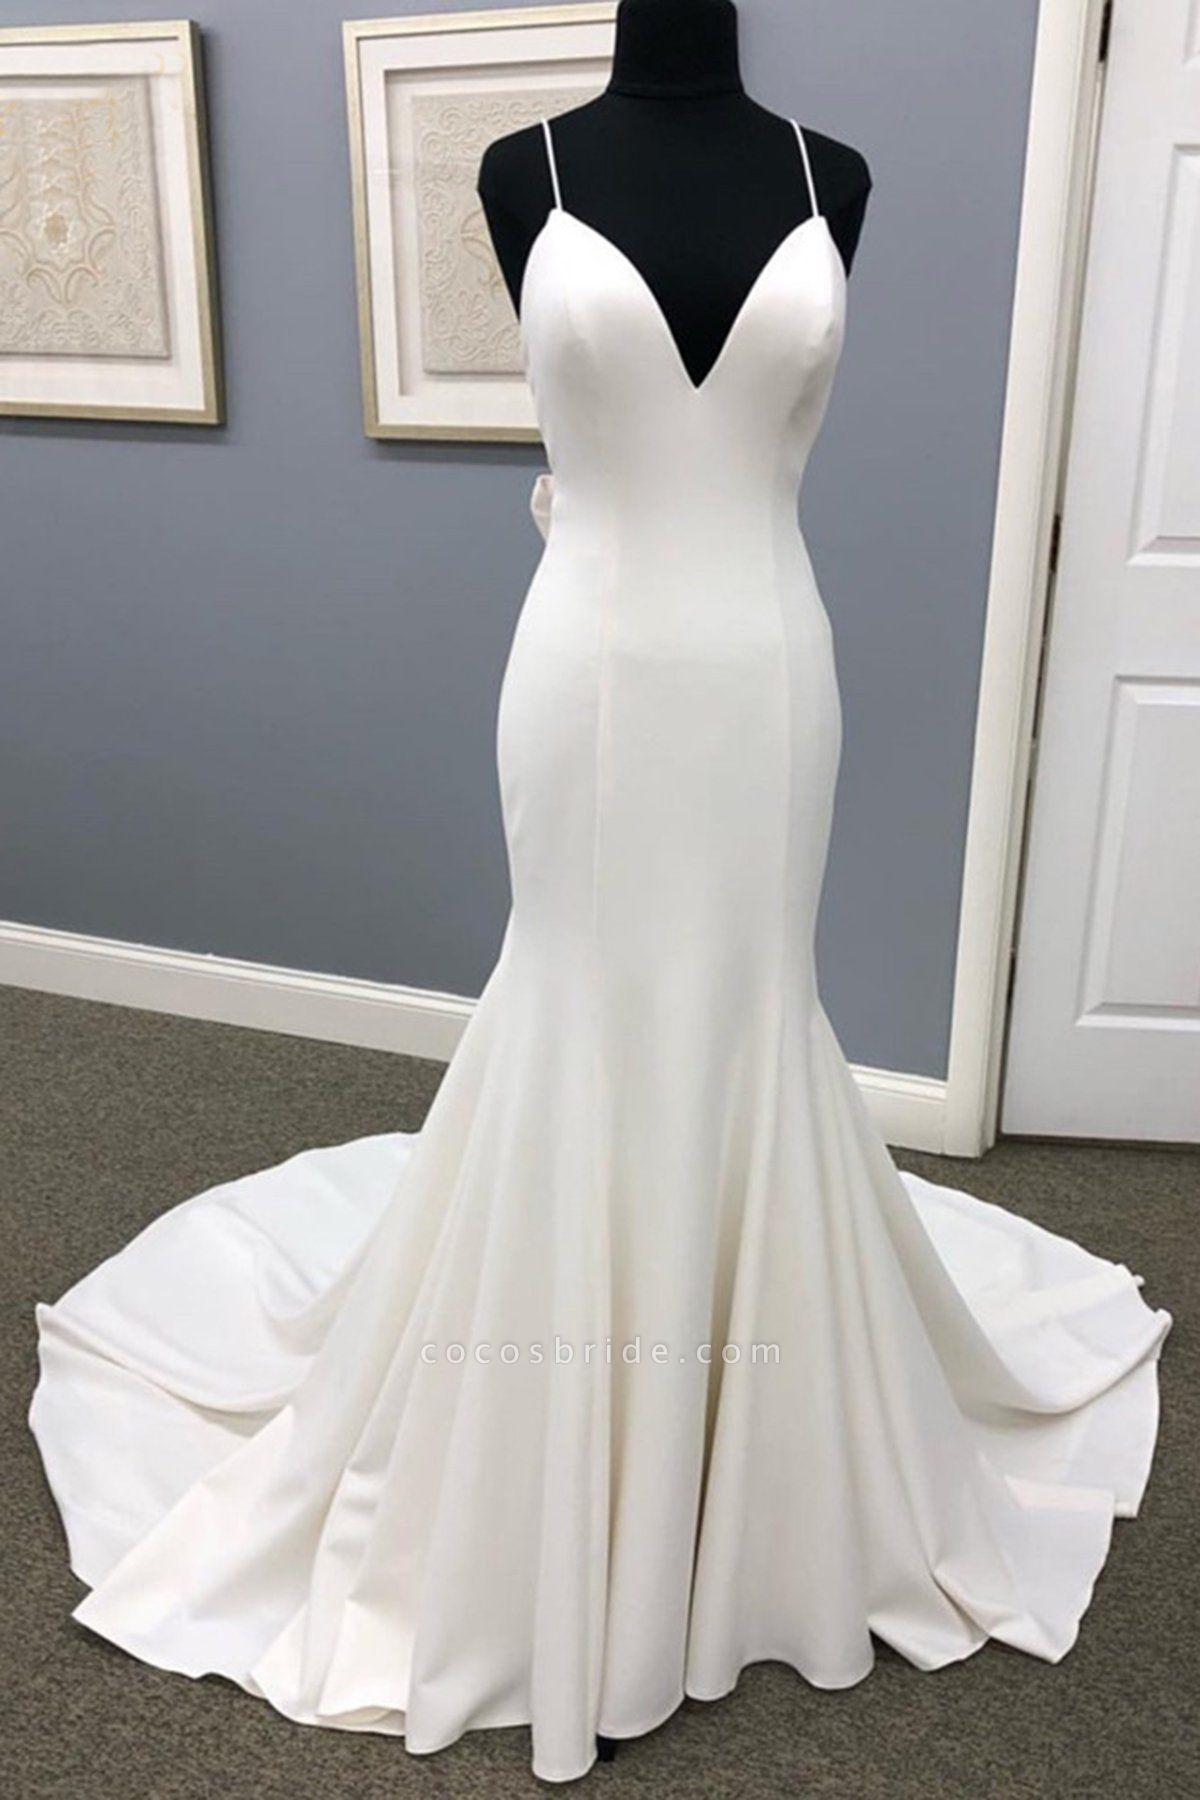 Ivory Satin Spaghetti Straps Open Back Sweet Train Wedding Dress